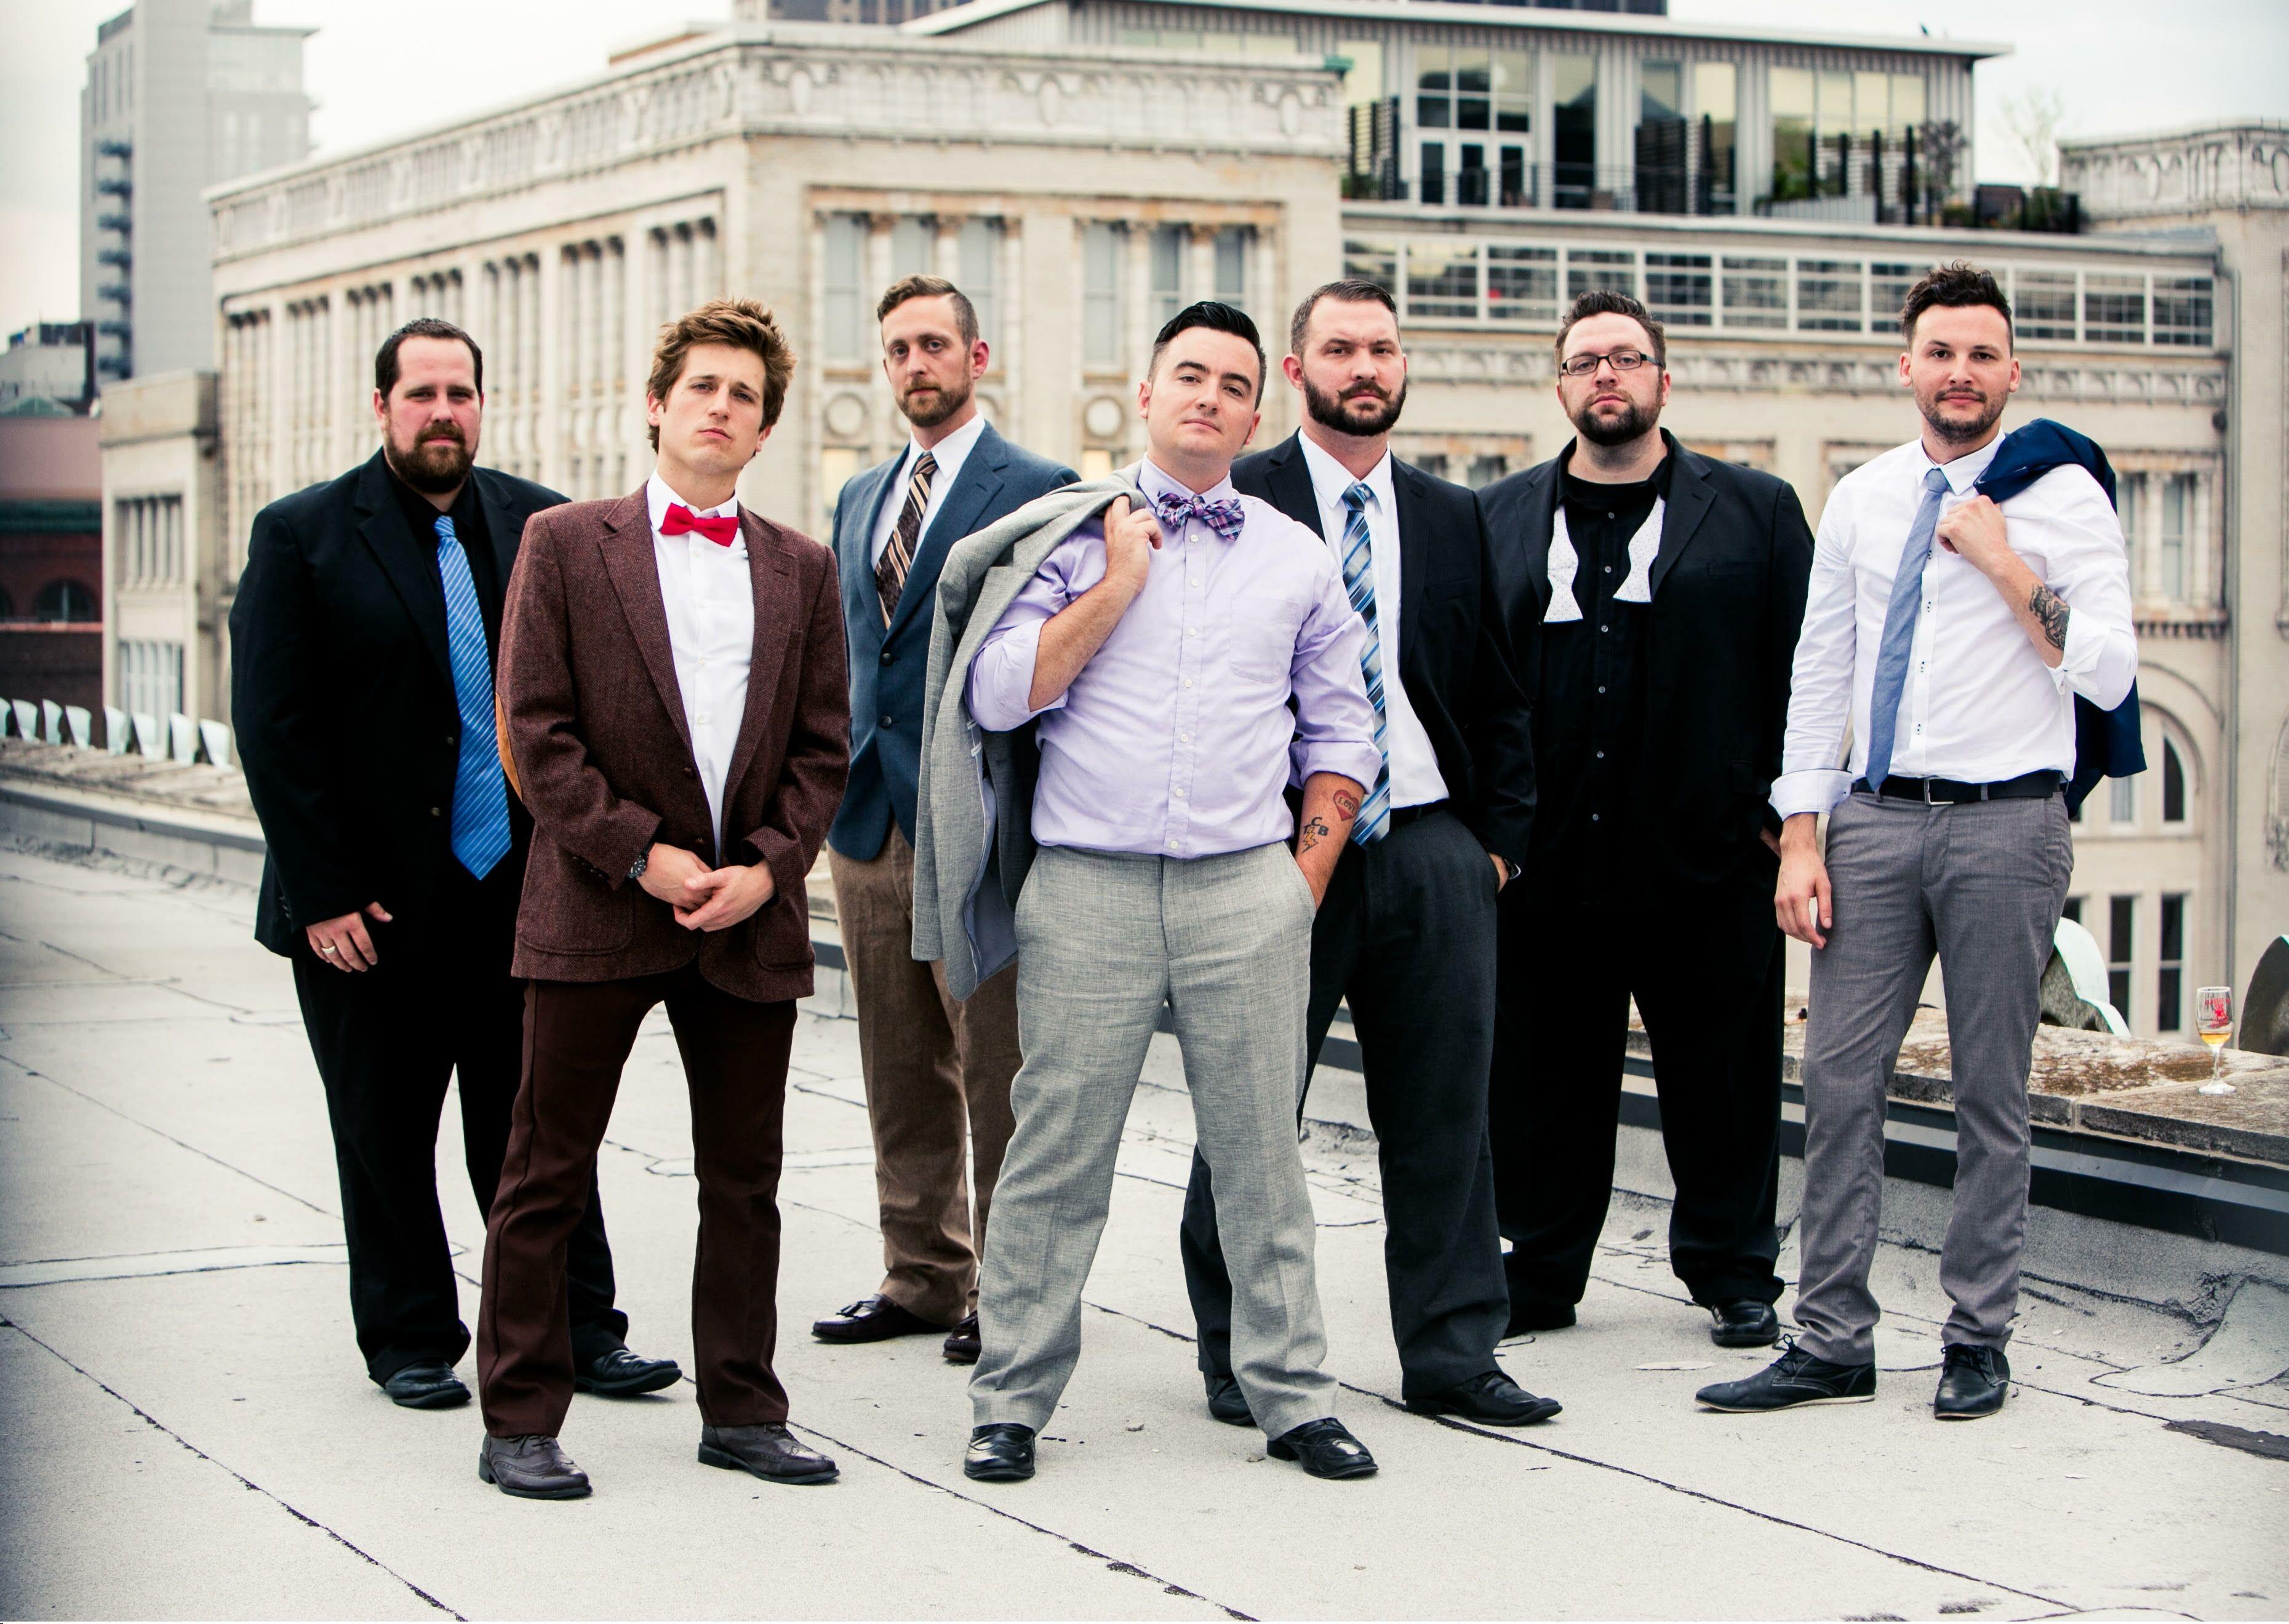 Kansas city bands wedding